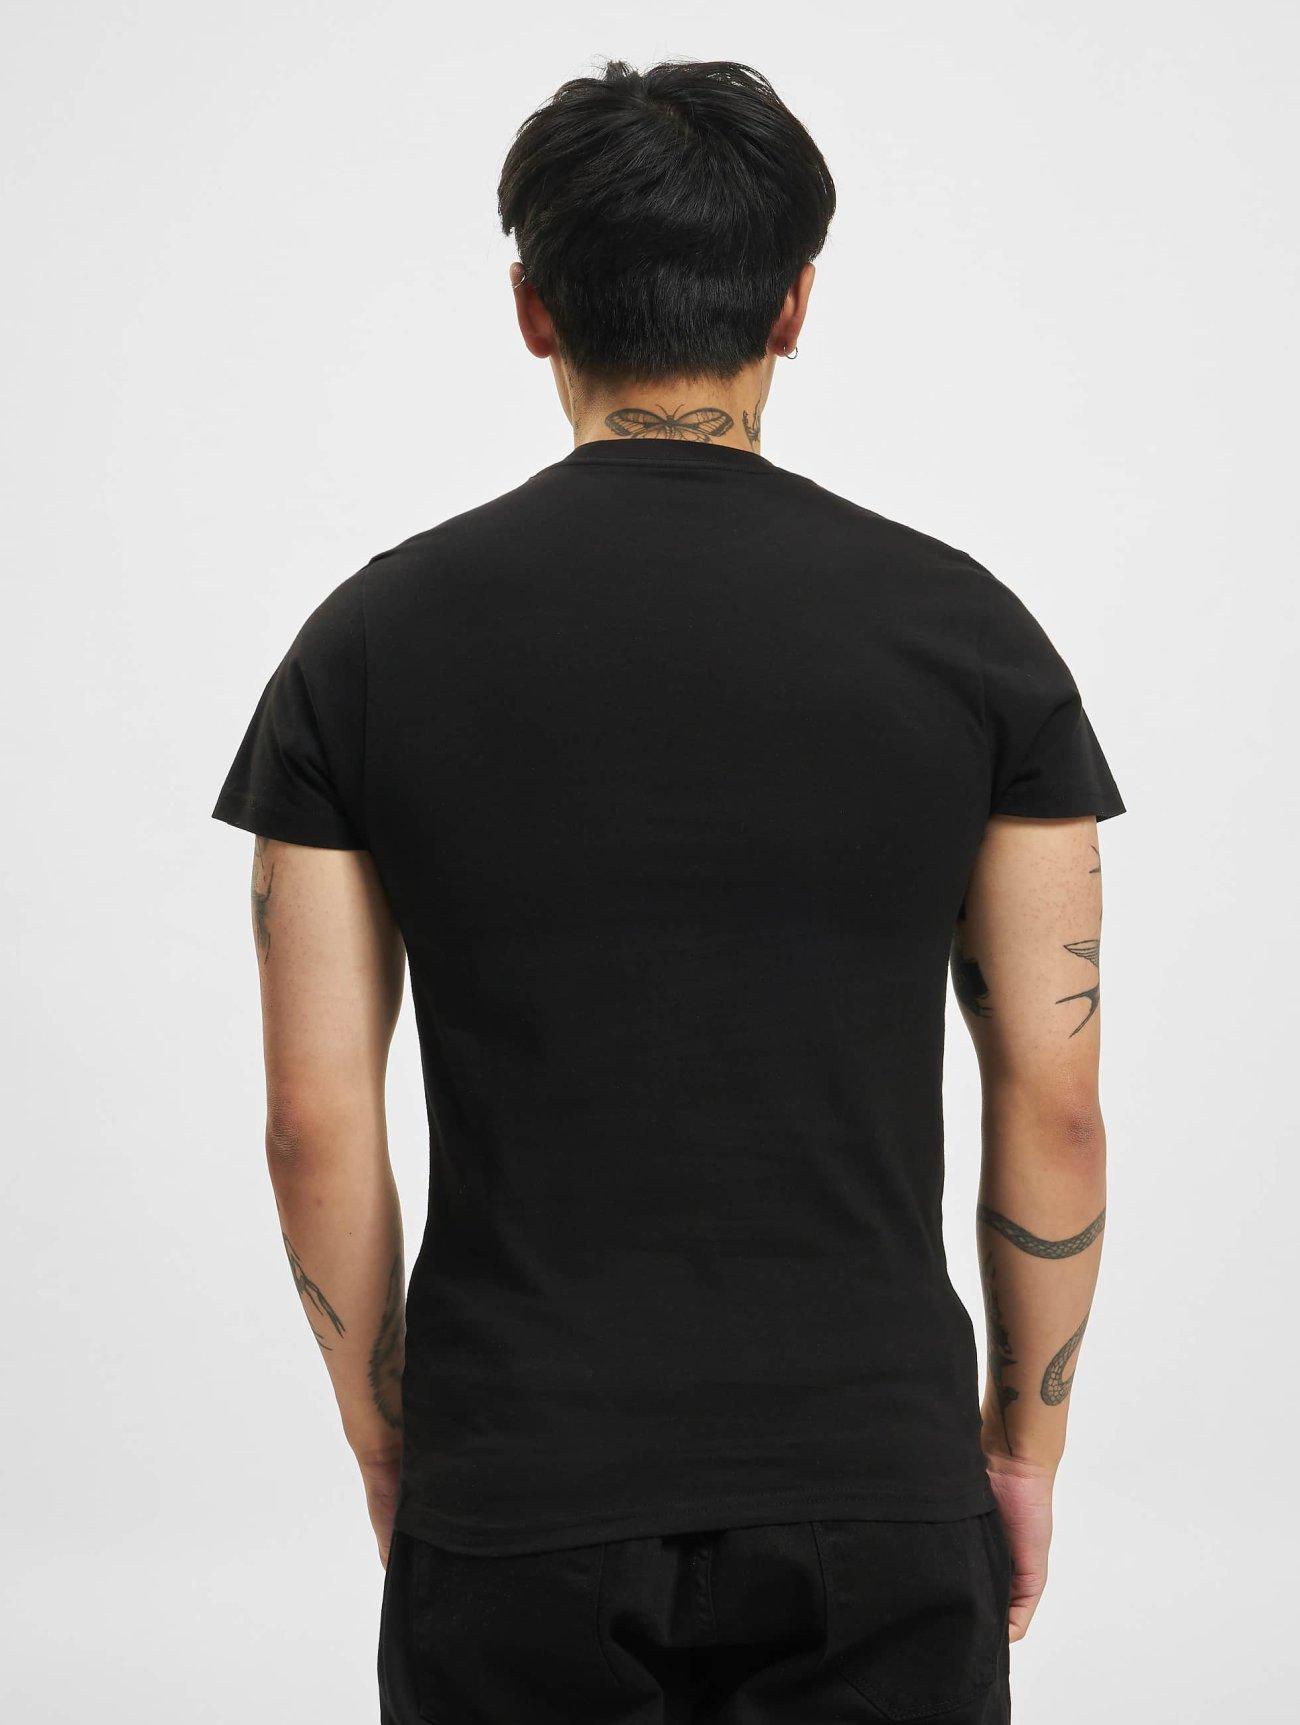 Vans Överdel / T-shirt OTW T-Shirt i svart 39670 Män Överdelar